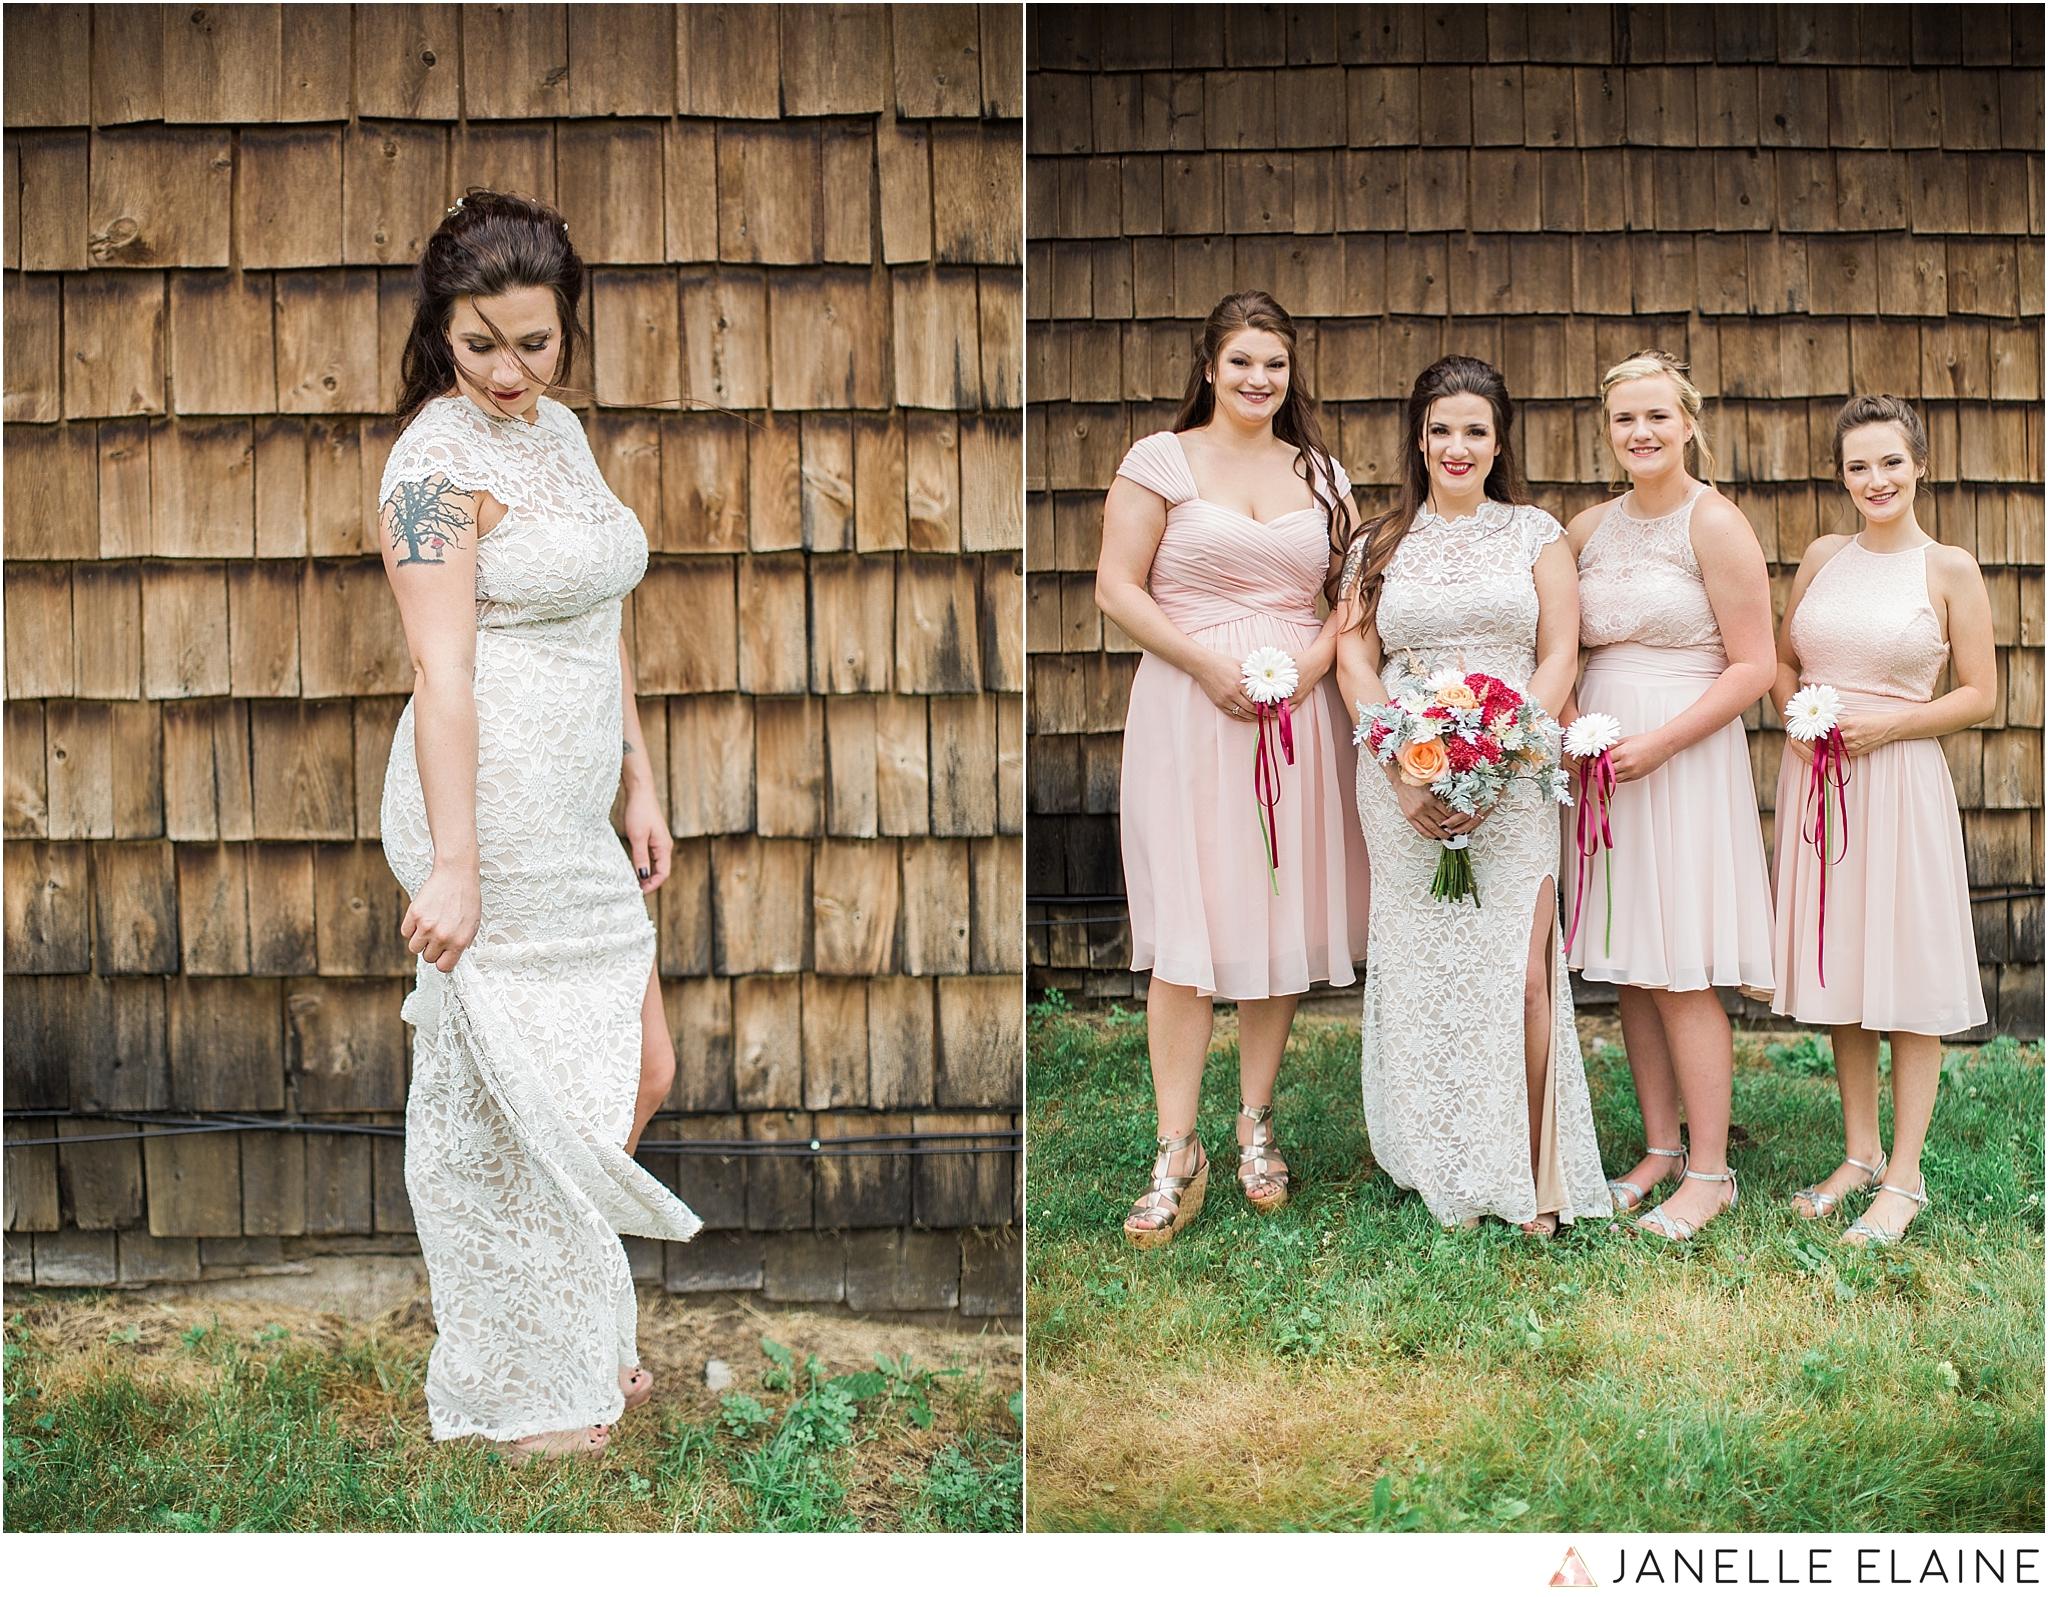 janelle elaine photography-seattle-destination-wedding-photographer-40.jpg